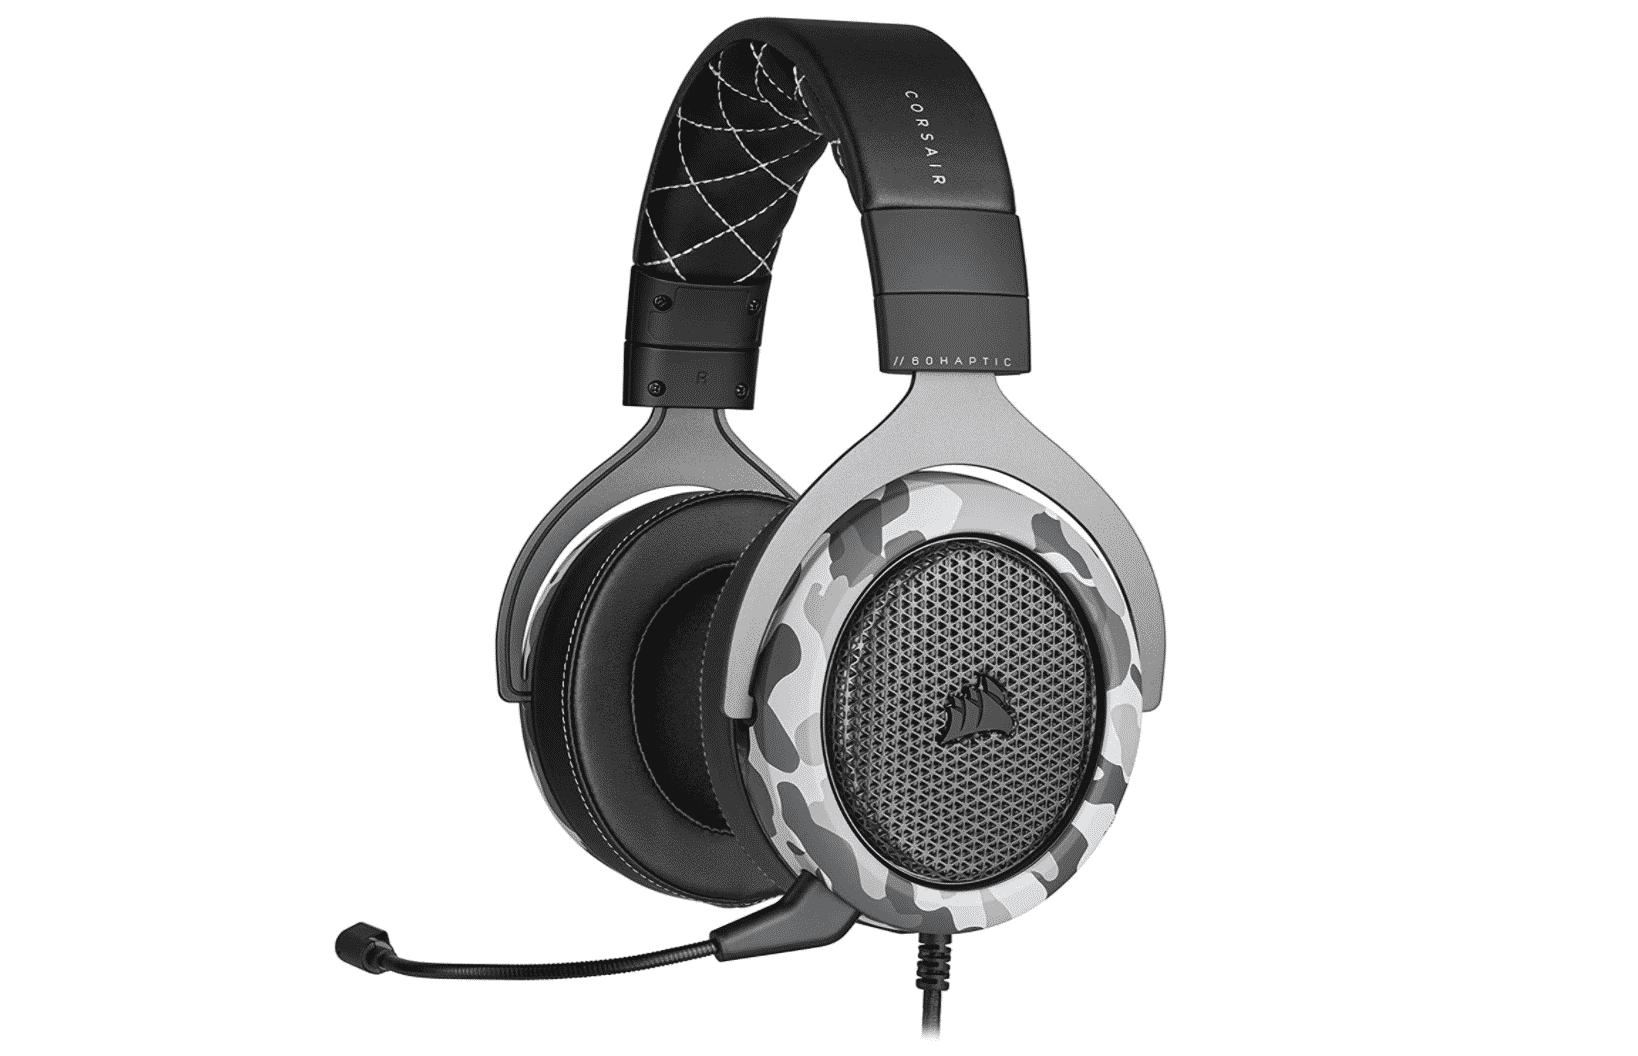 CORSAIR Haptic Stereo Gaming Headset